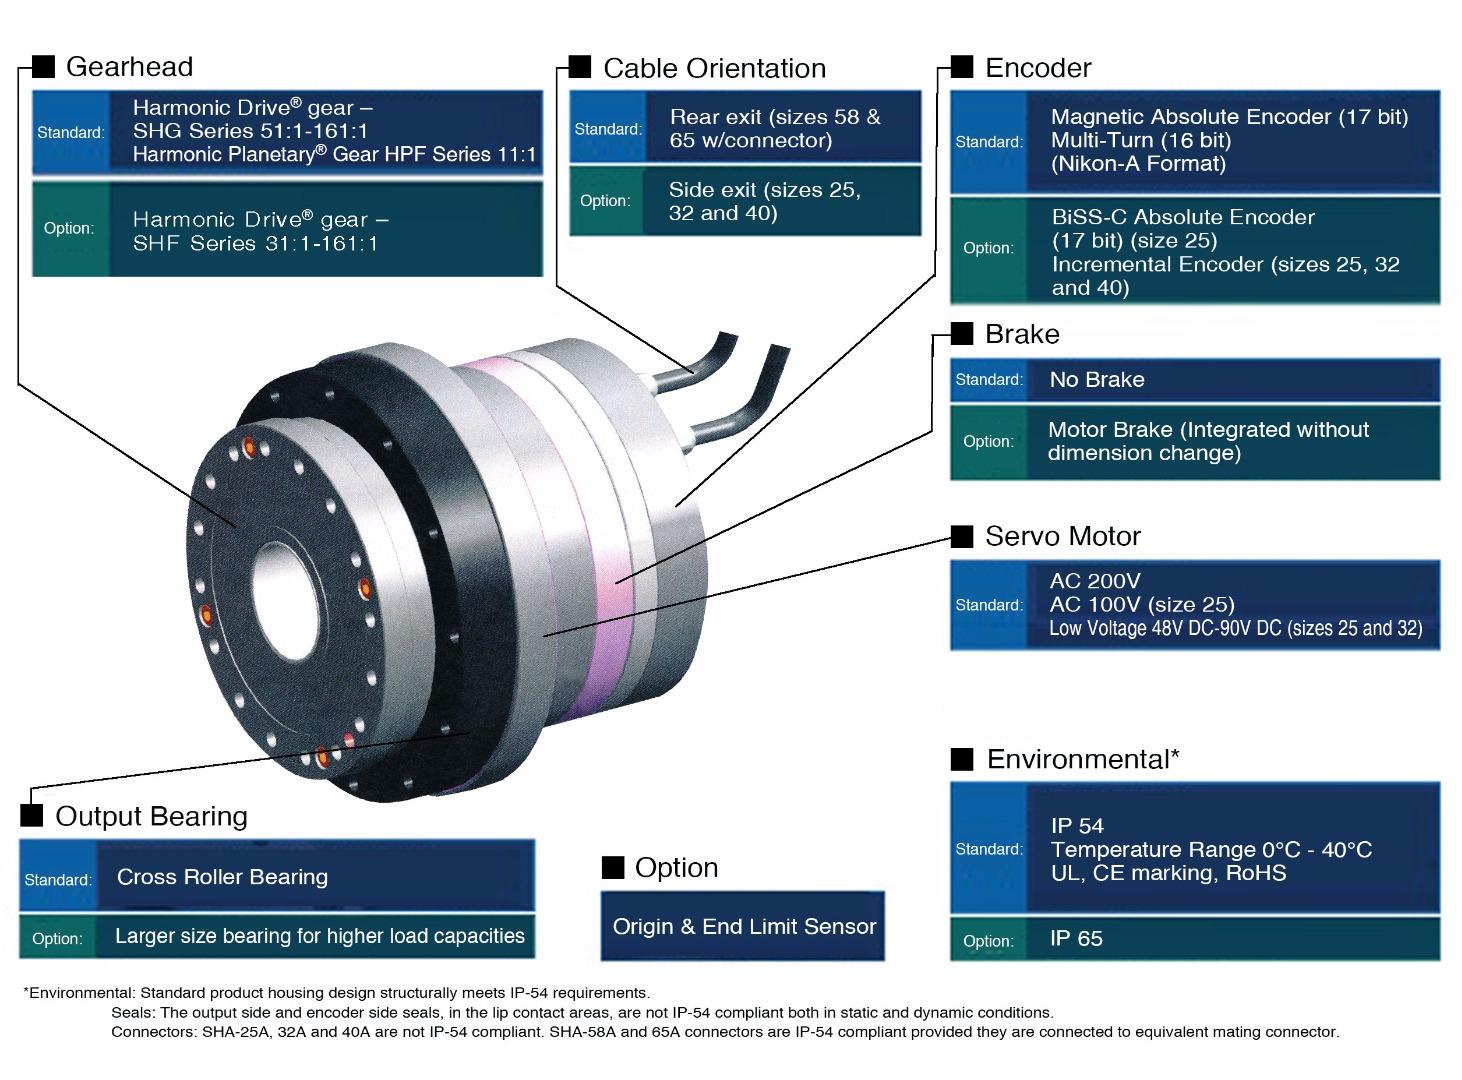 Sha Hollow Shaft Actuator Harmonic Drive Low Voltage Motor Drivers Manual